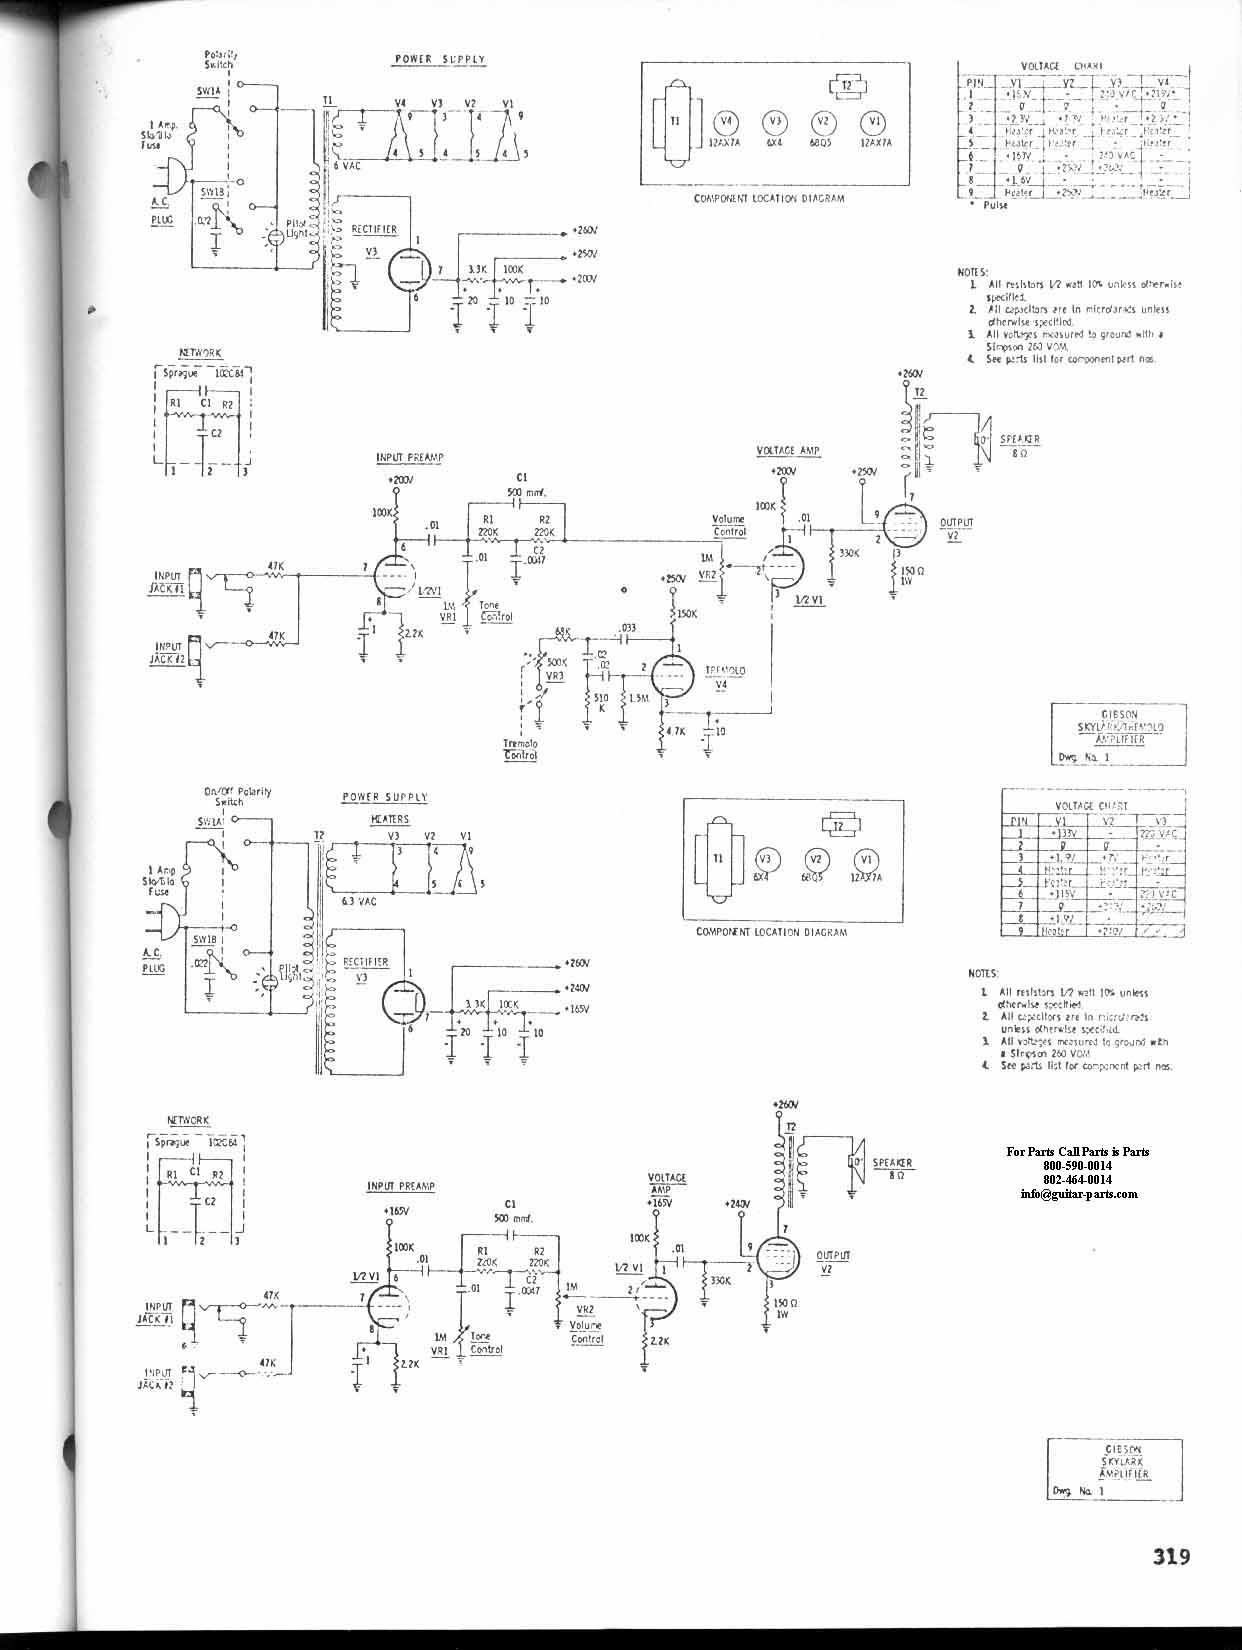 Les Paul Tone Control Schematic